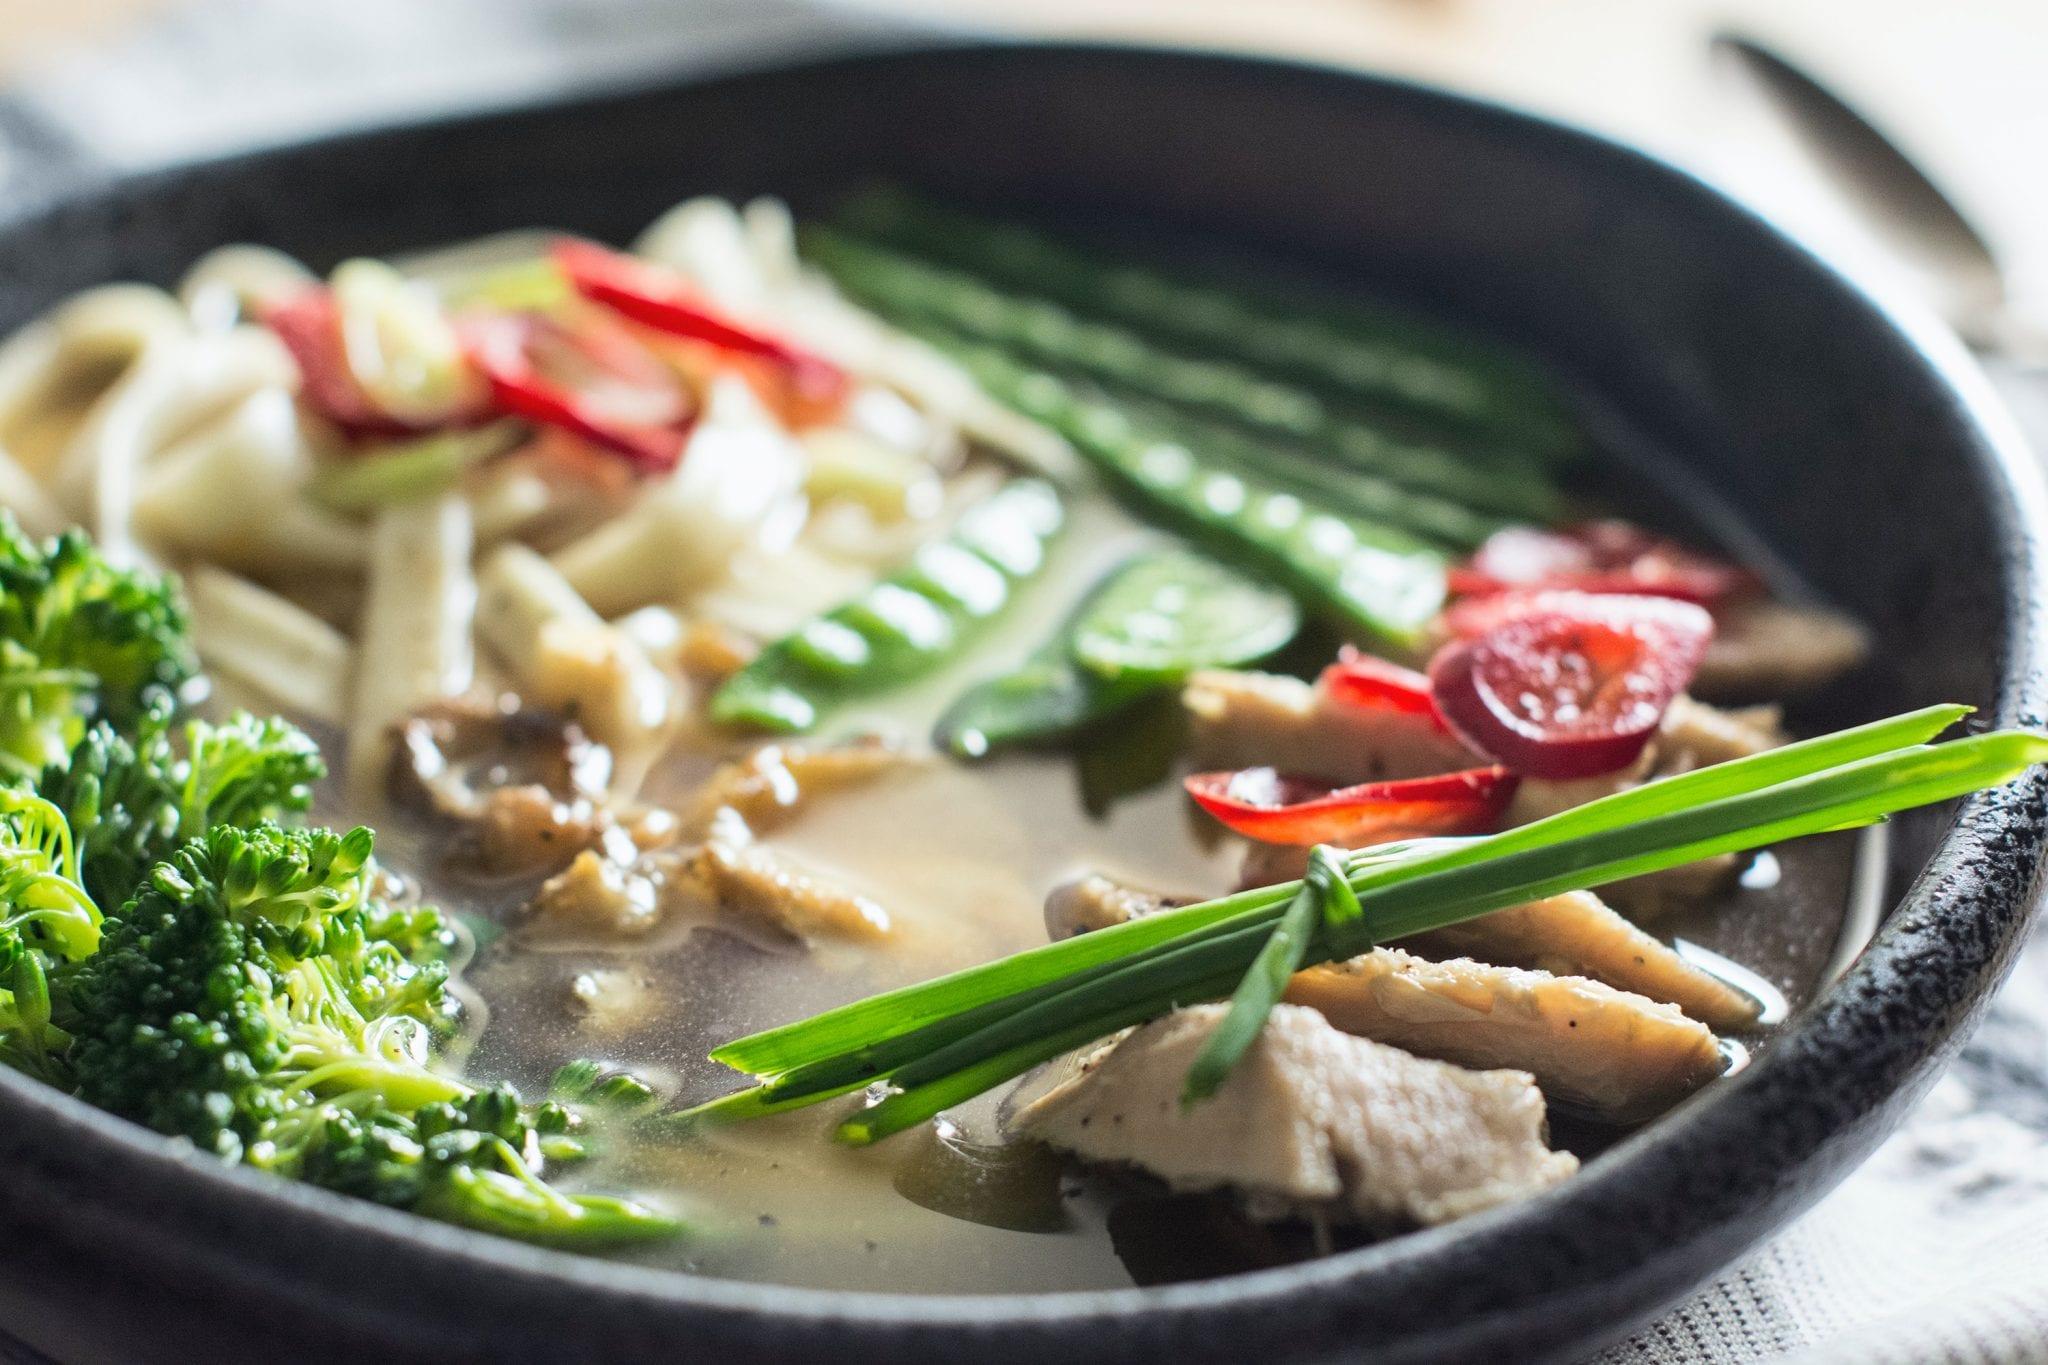 Korean food, a ramen, for takeaway during quarantine